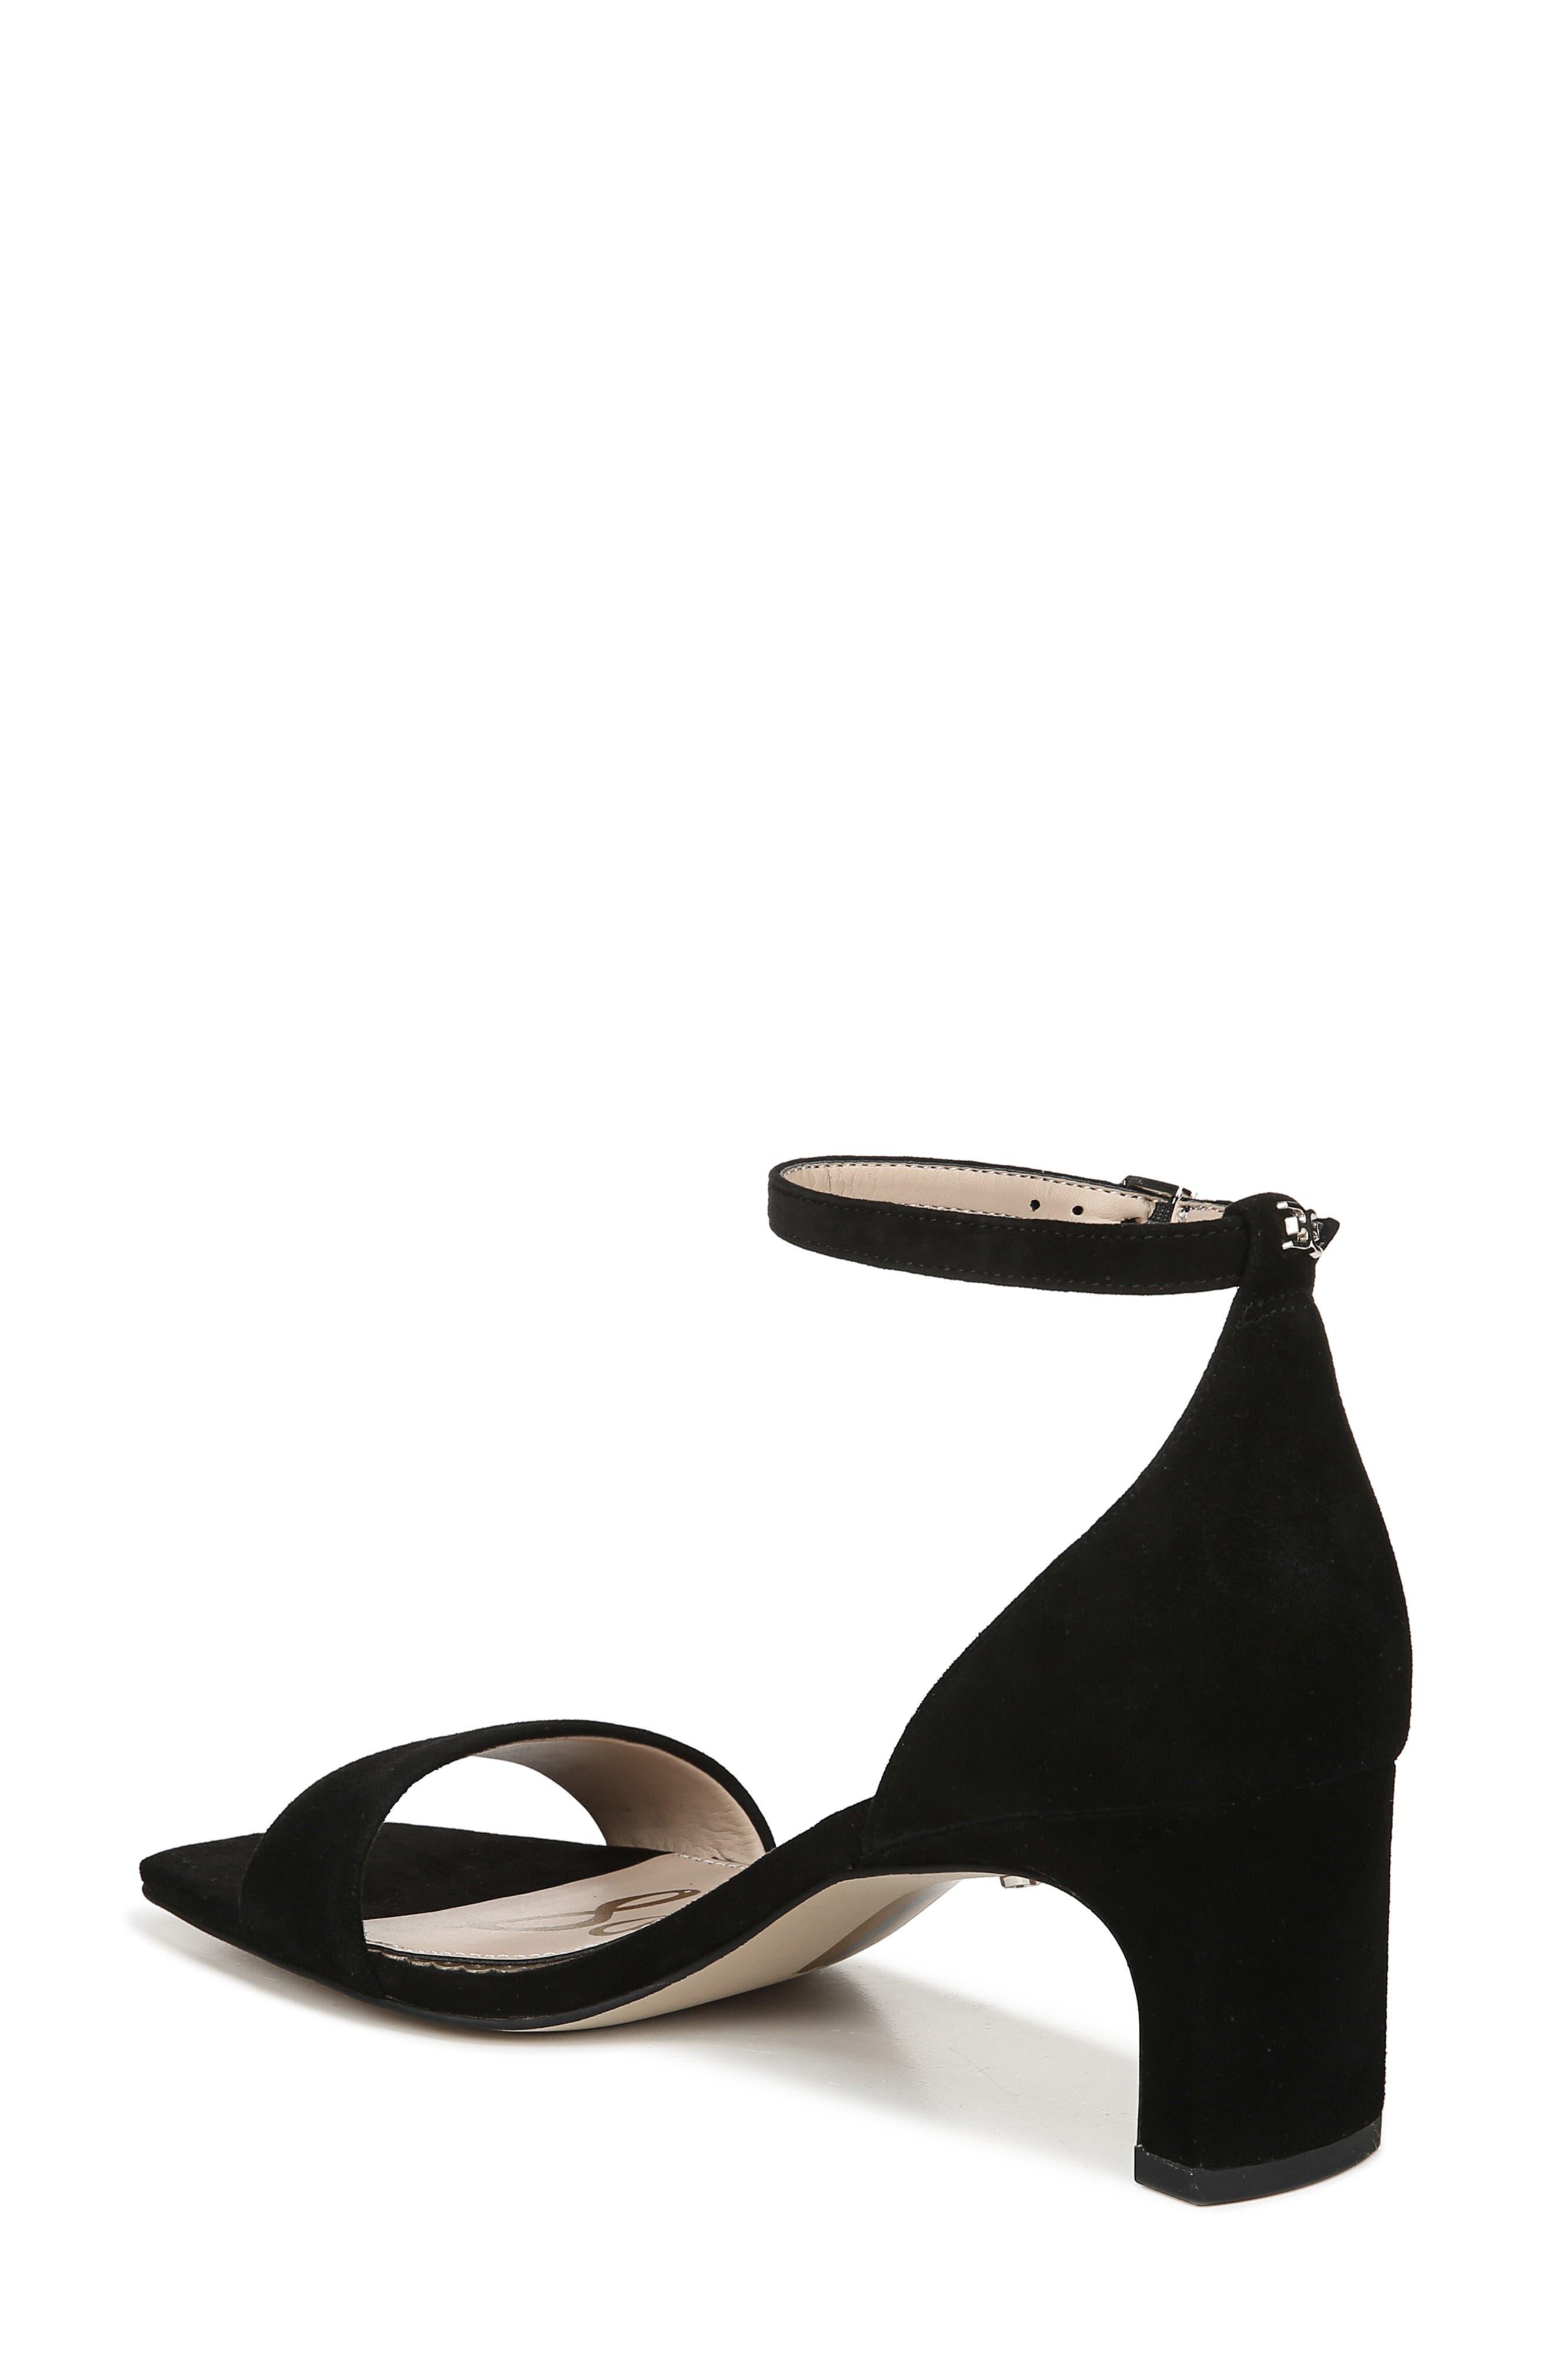 SAM EDELMAN, Holmes Ankle Strap Sandal, Alternate thumbnail 2, color, BLACK SUEDE LEATHER